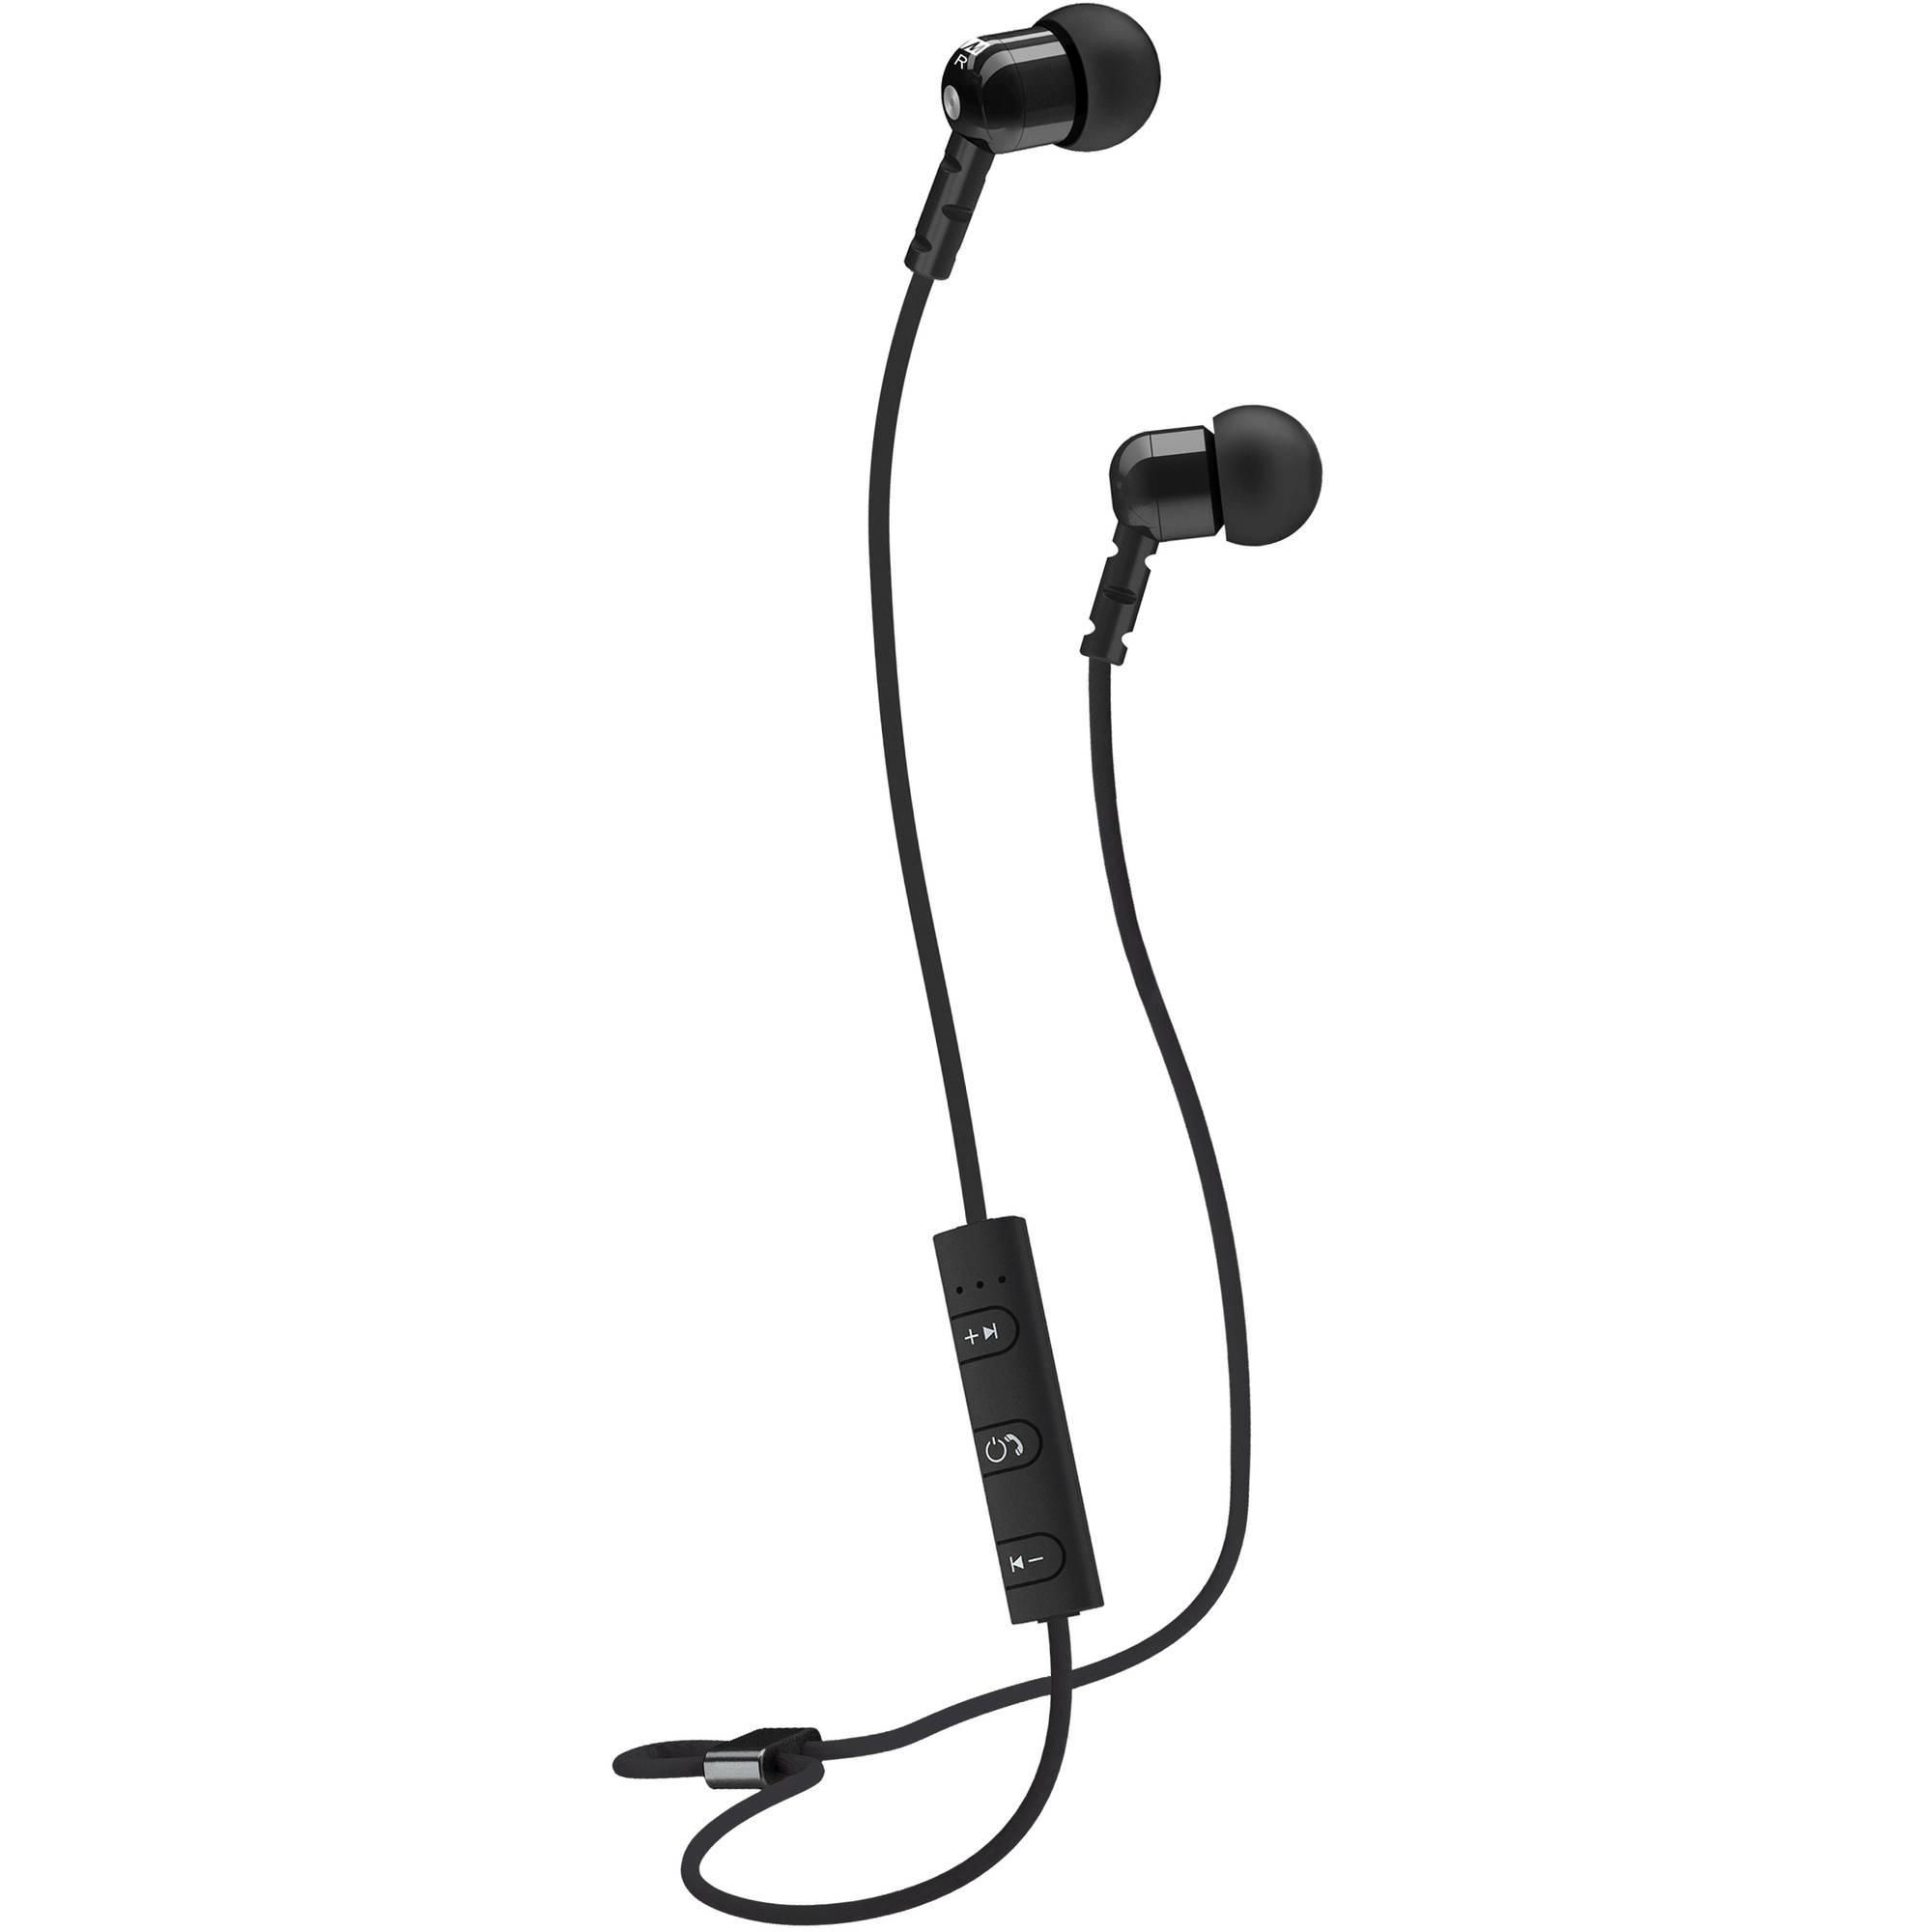 MEE audio M9 Bluetooth Wireless In-Ear Headphones